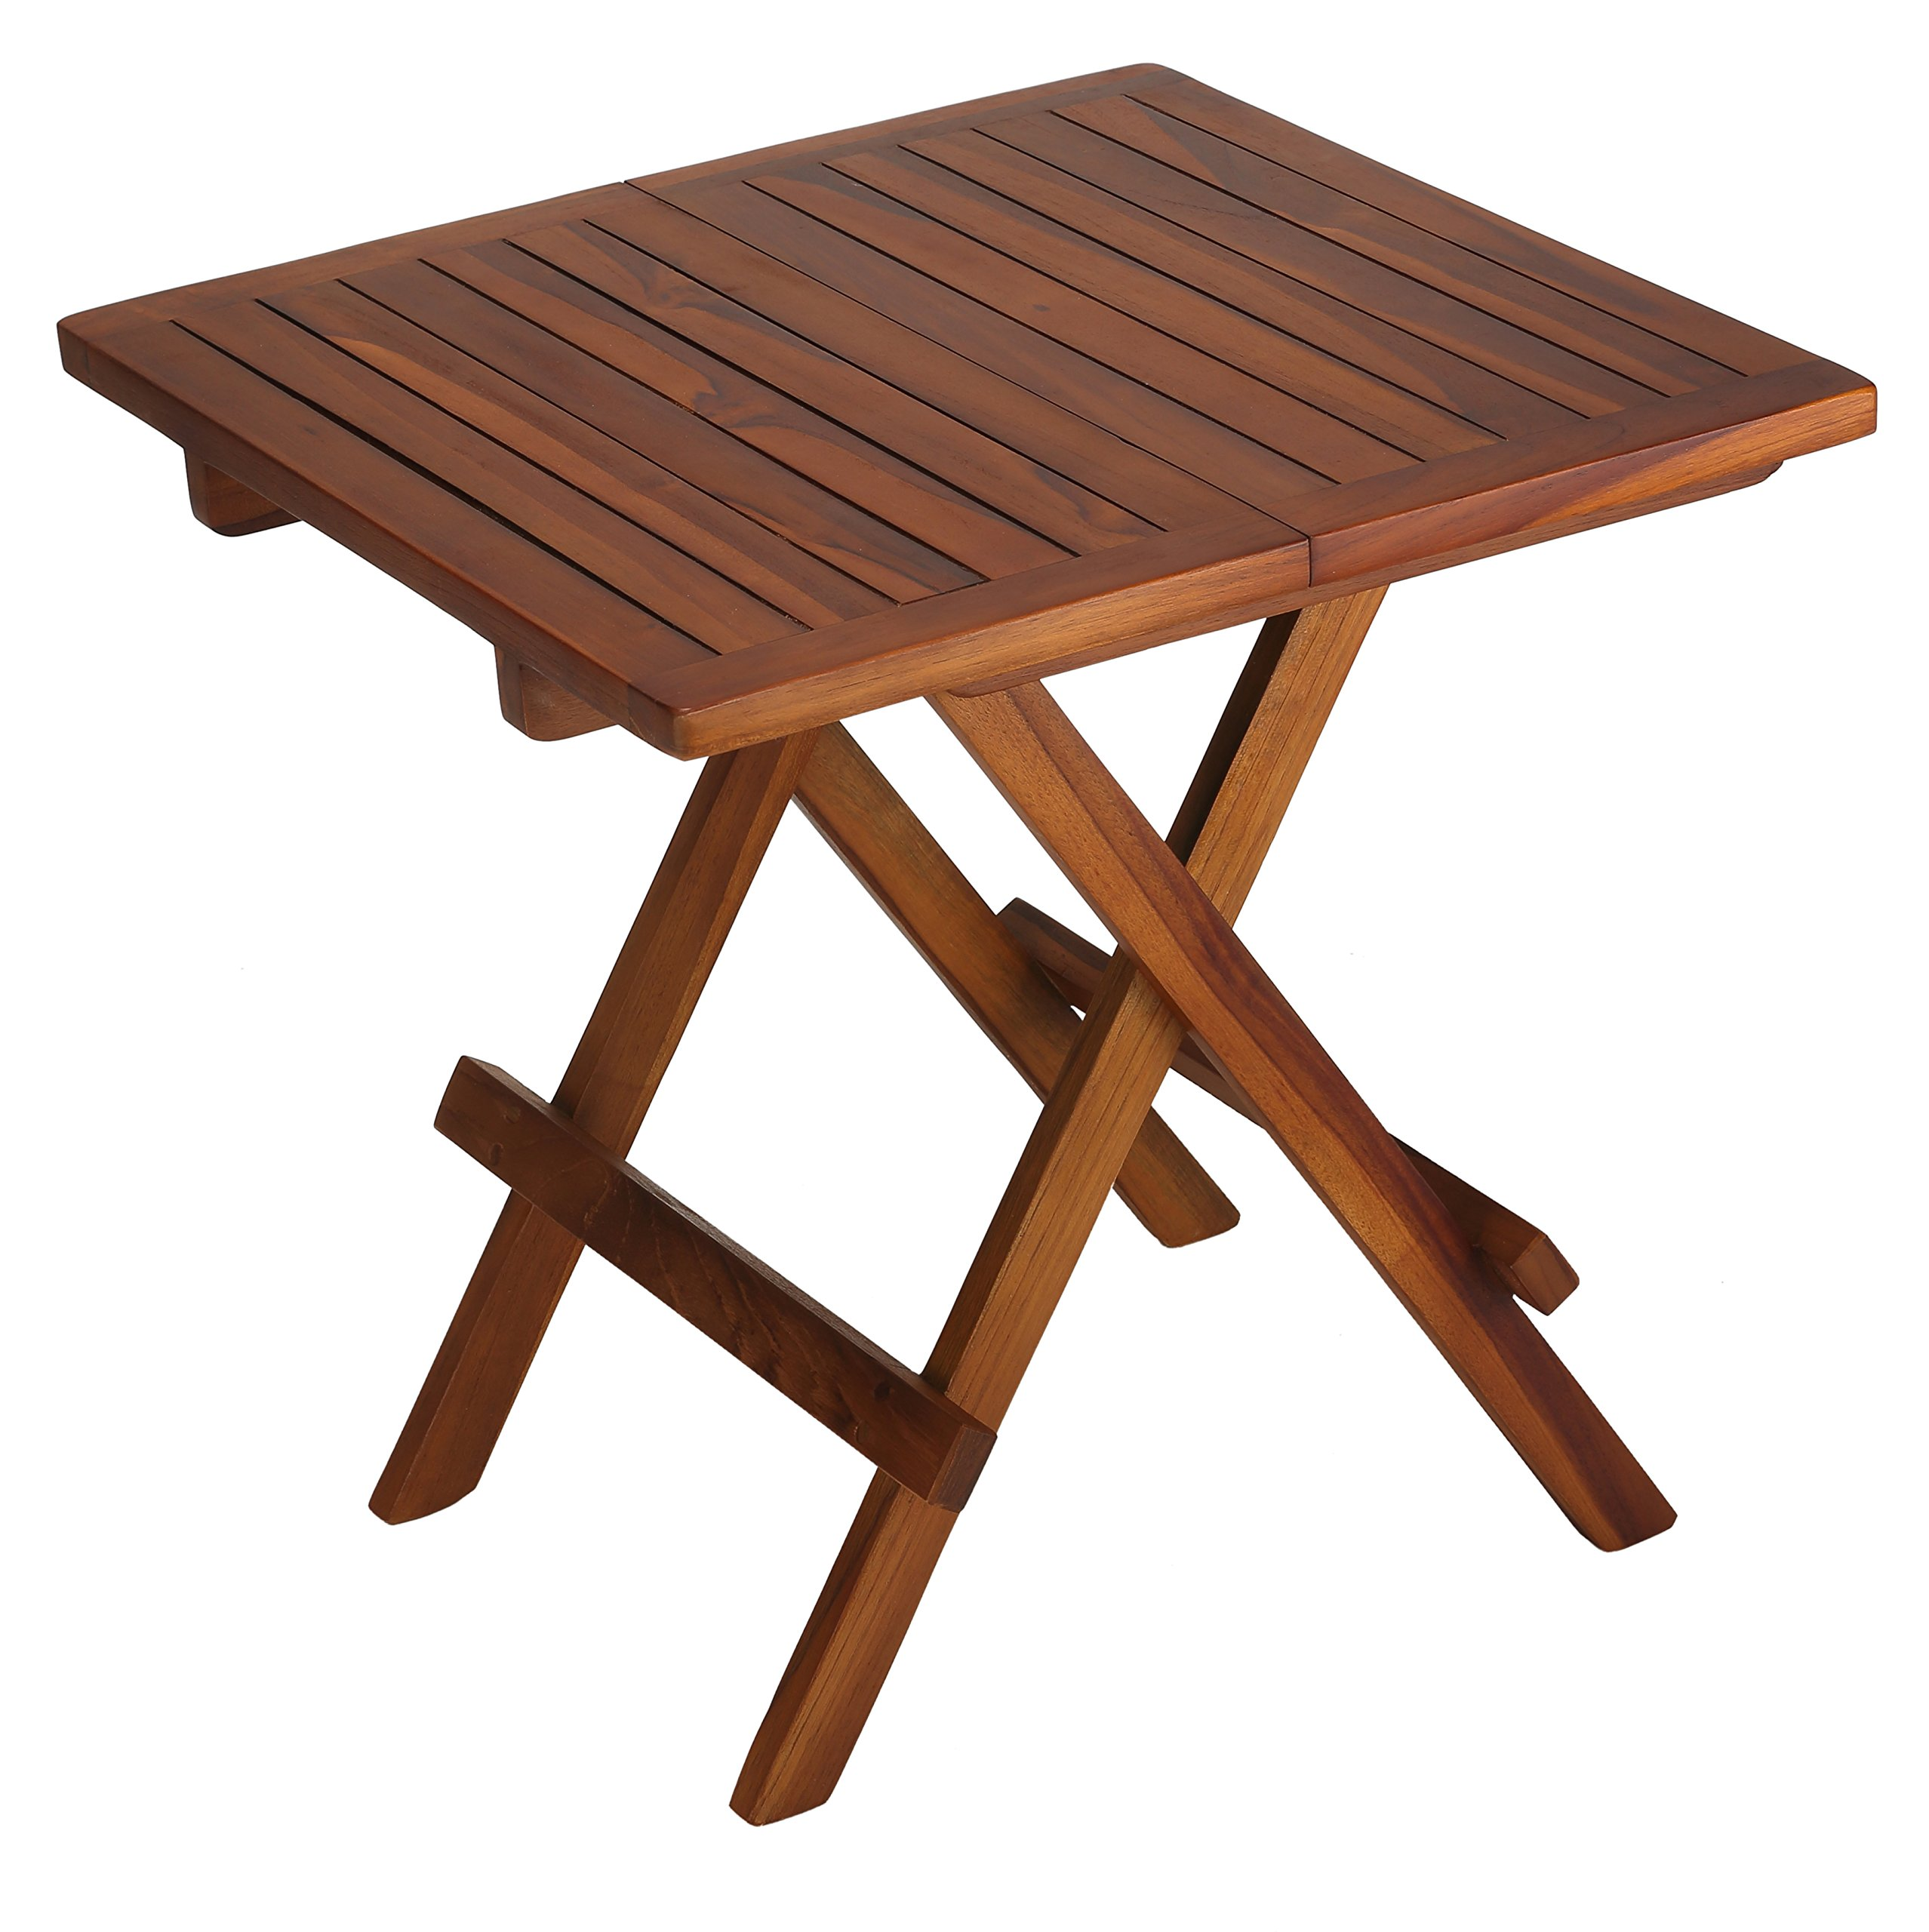 Bare Decor Ravinia Folding Teak Small Table, Oiled Finish by Bare Decor